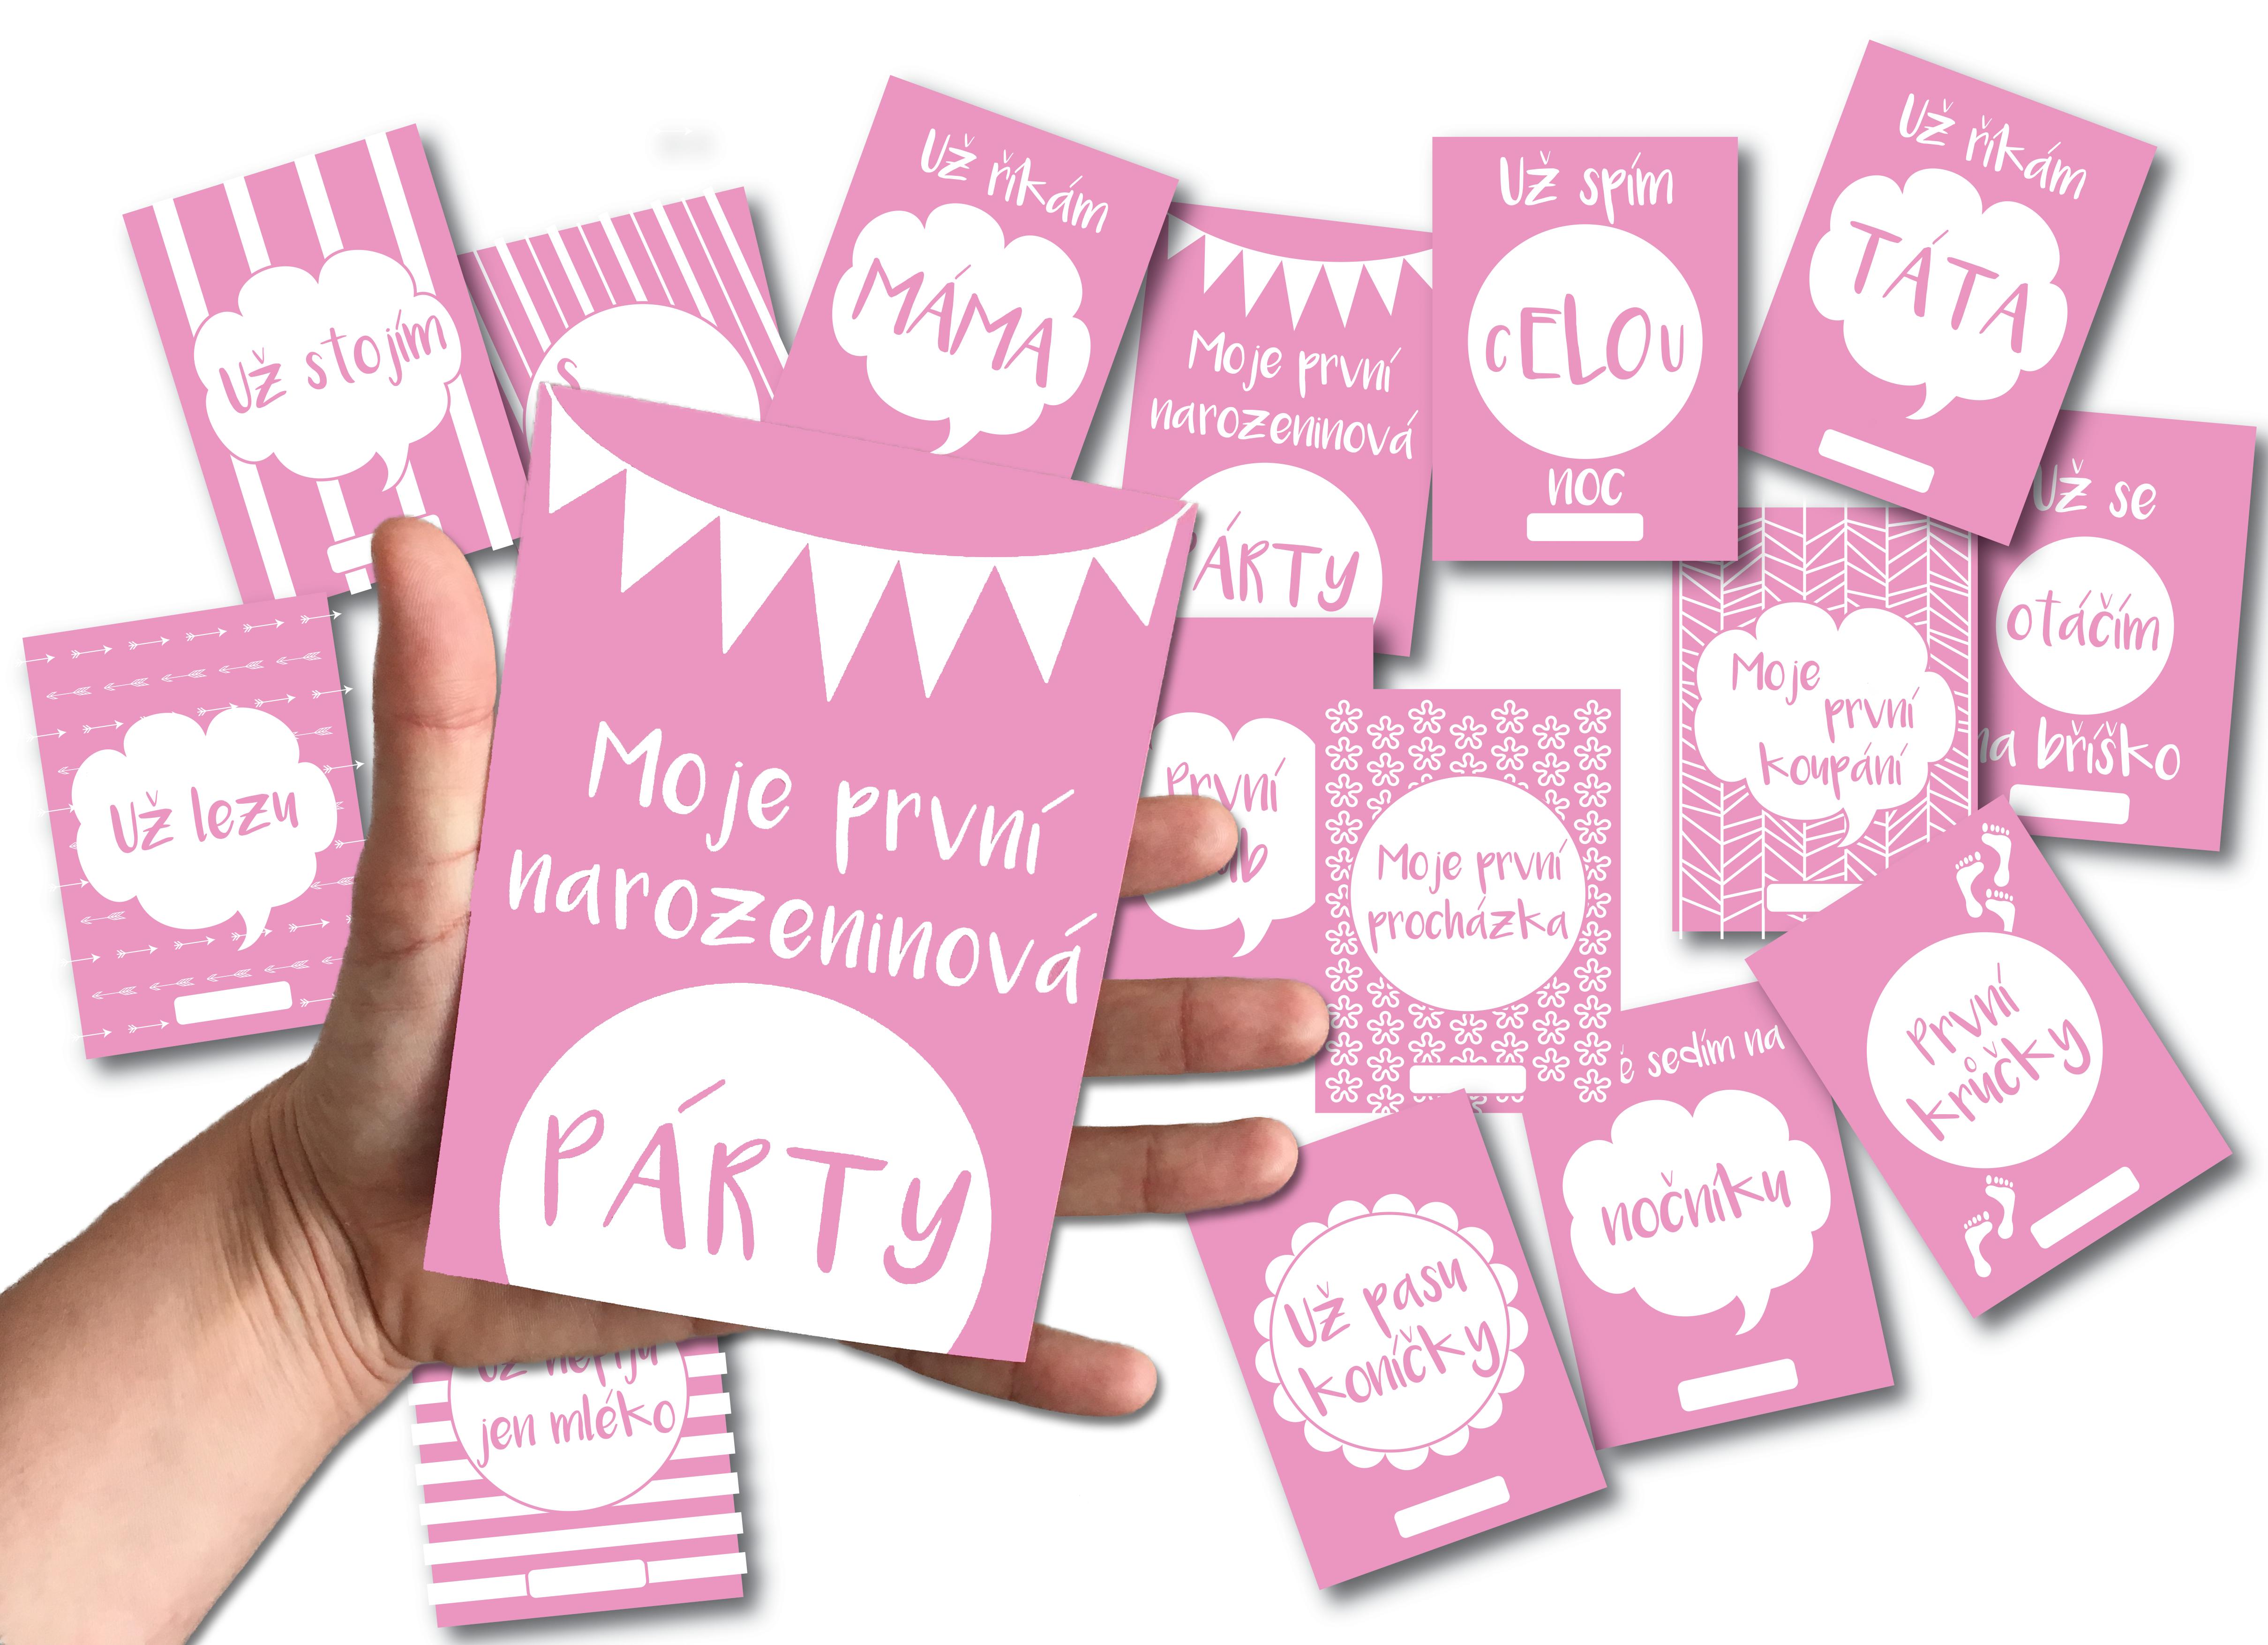 Milníkové kartičky - k čemu je ten hit Instagramu?